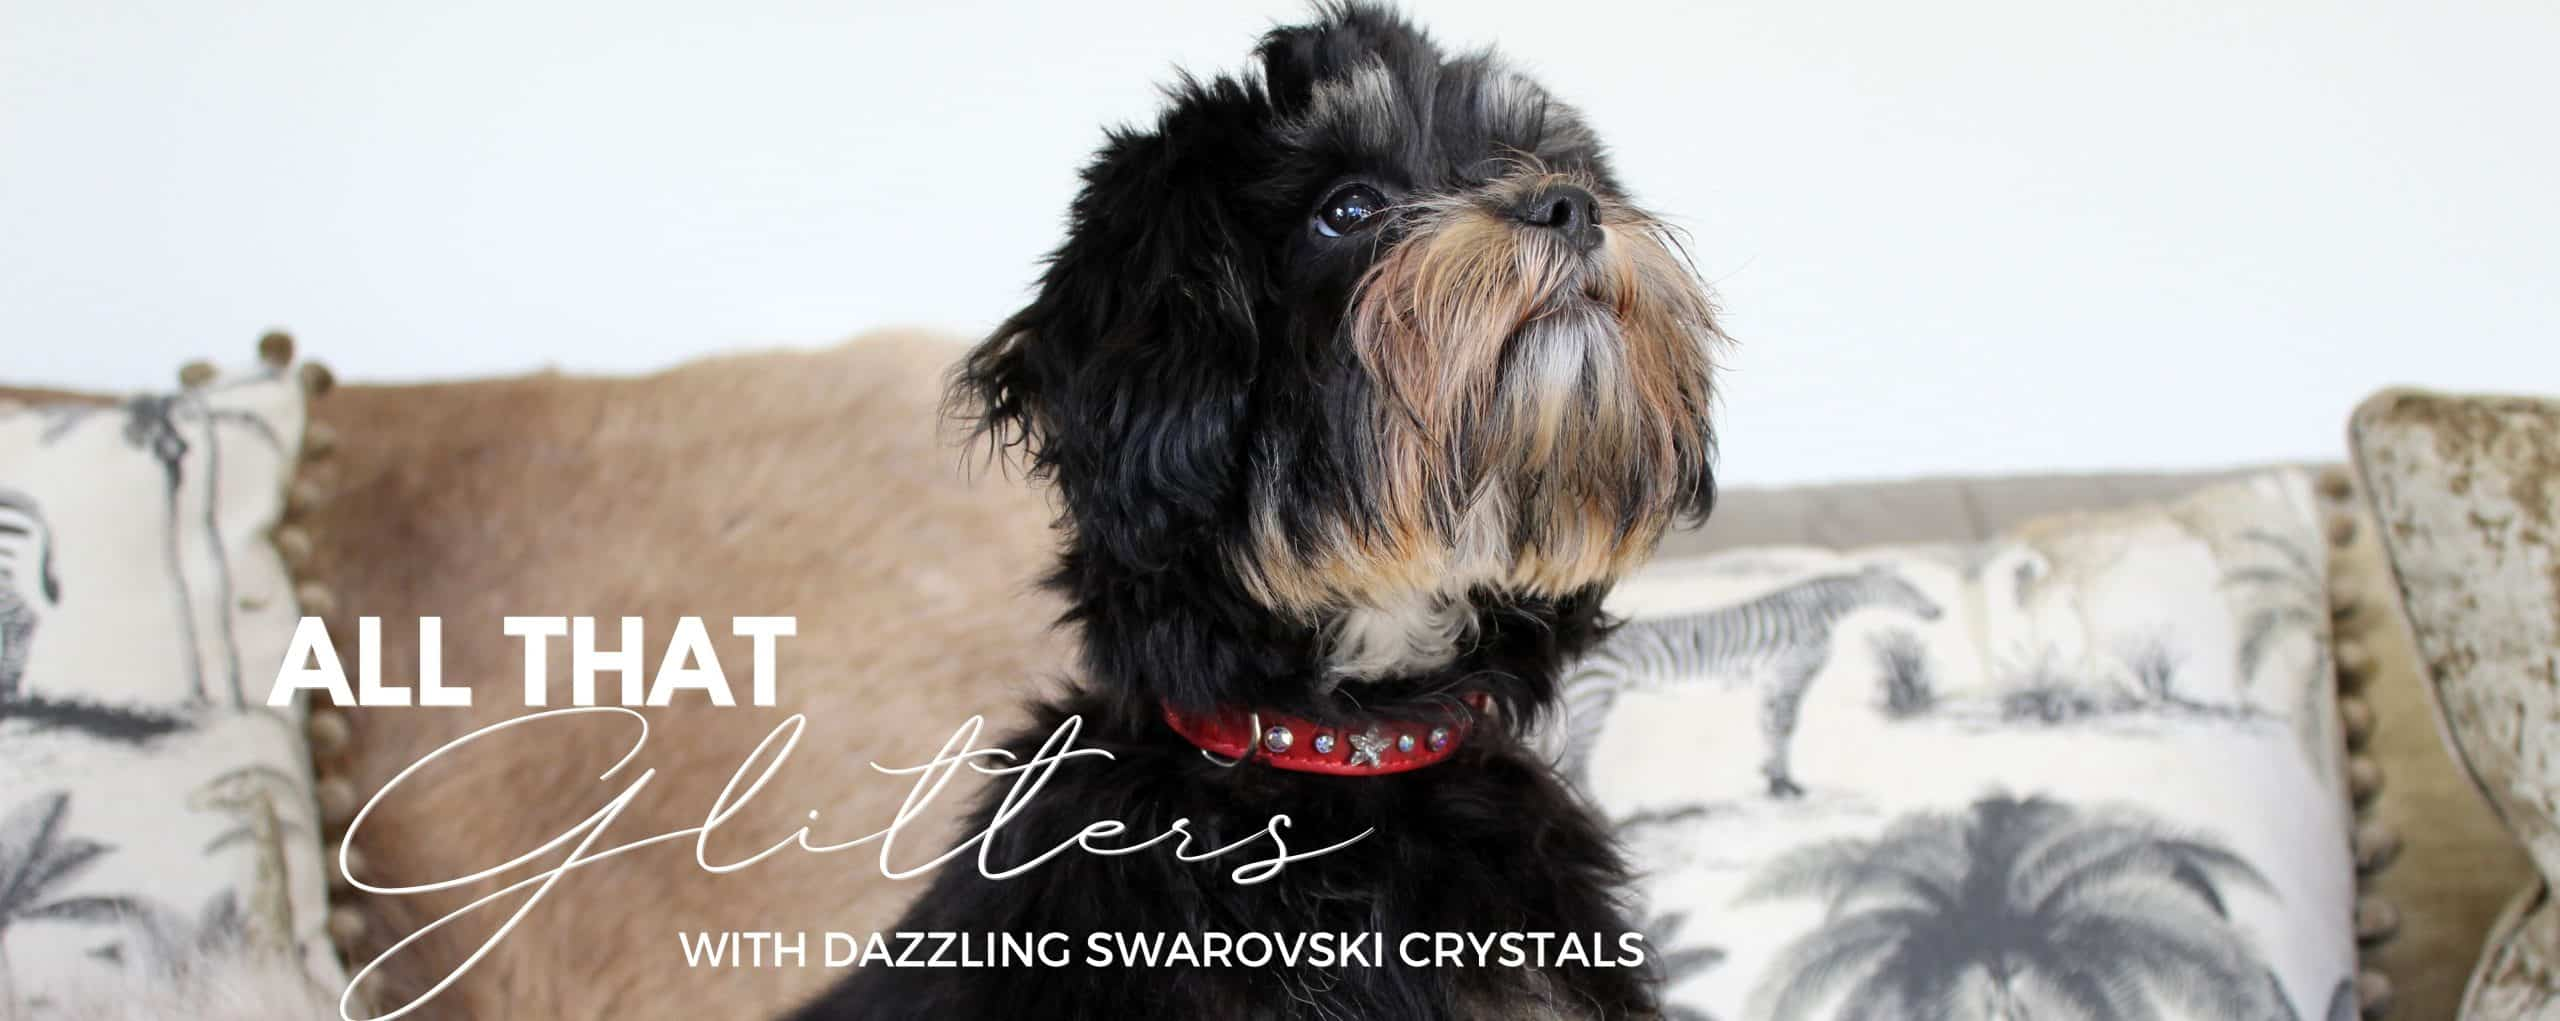 Dog Collar Swarovski Crystals Home Page Banner